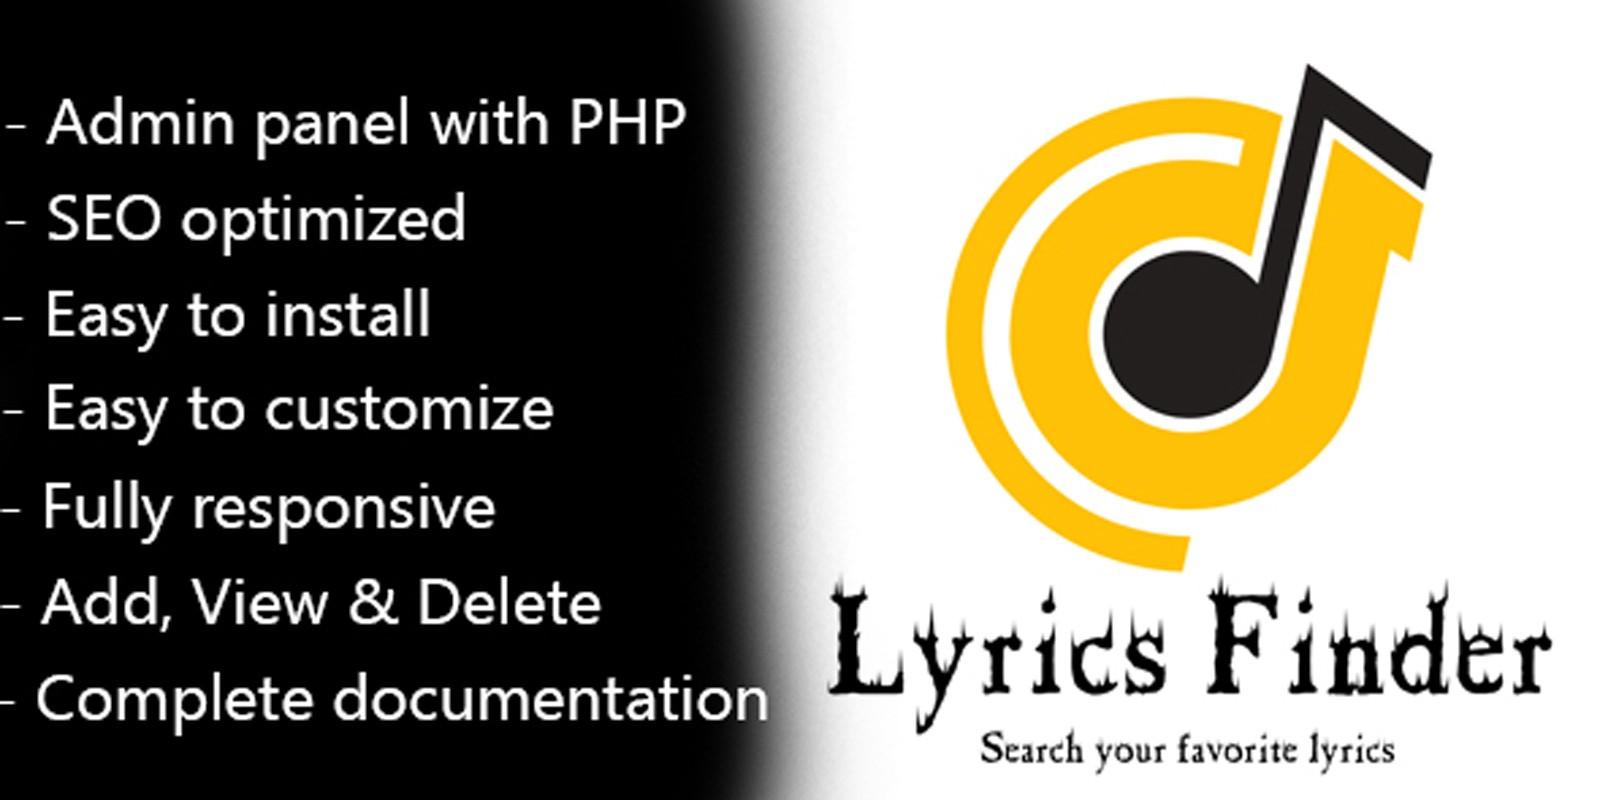 Lyrics Finder PHP Script